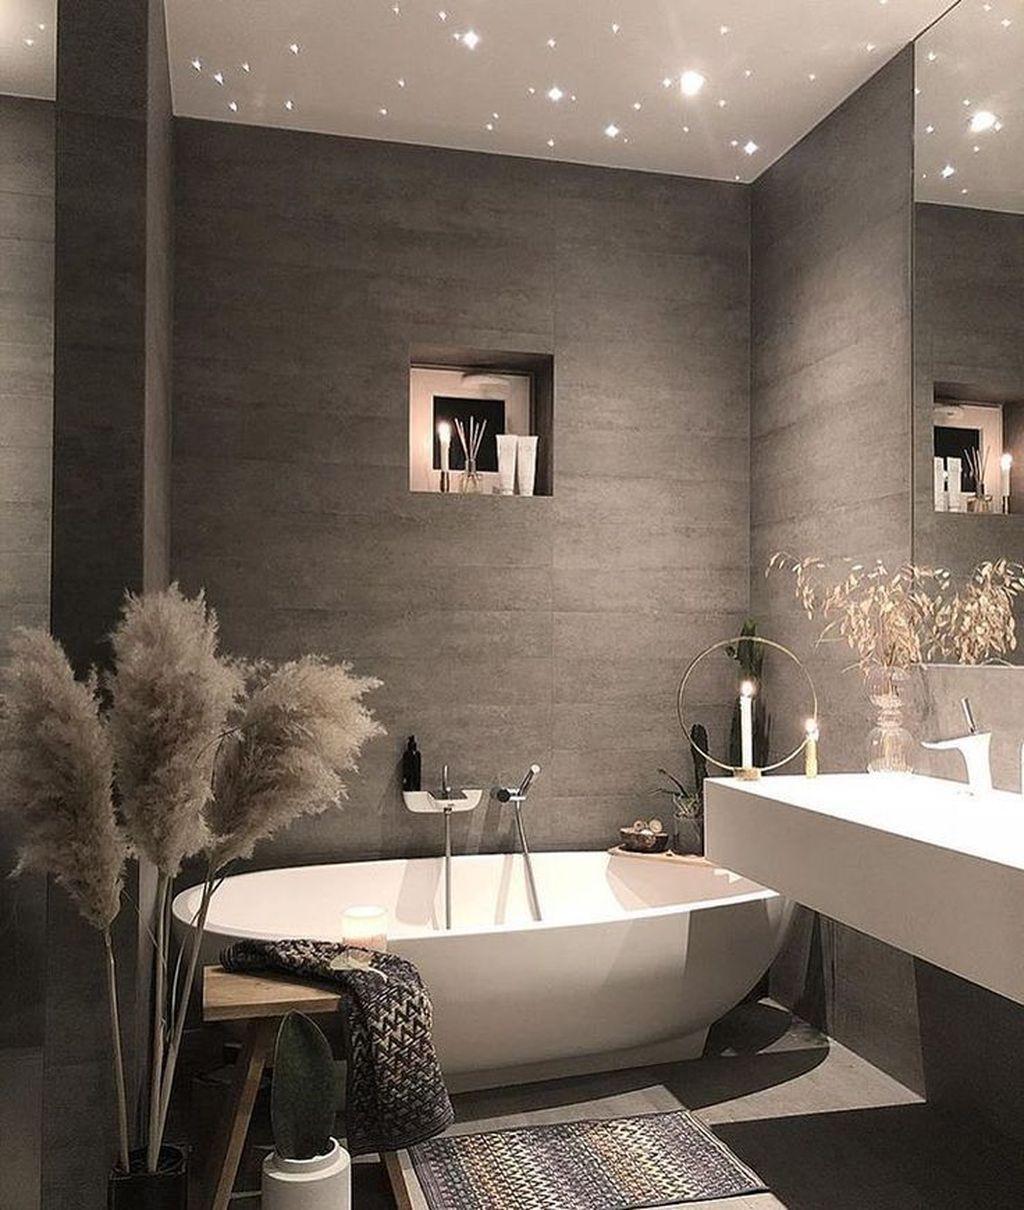 34 Stunning Bathroom Decoration Ideas Trends 2020 Bathrooms Remodel Bathroom Decor Apartment Bathroom Interior